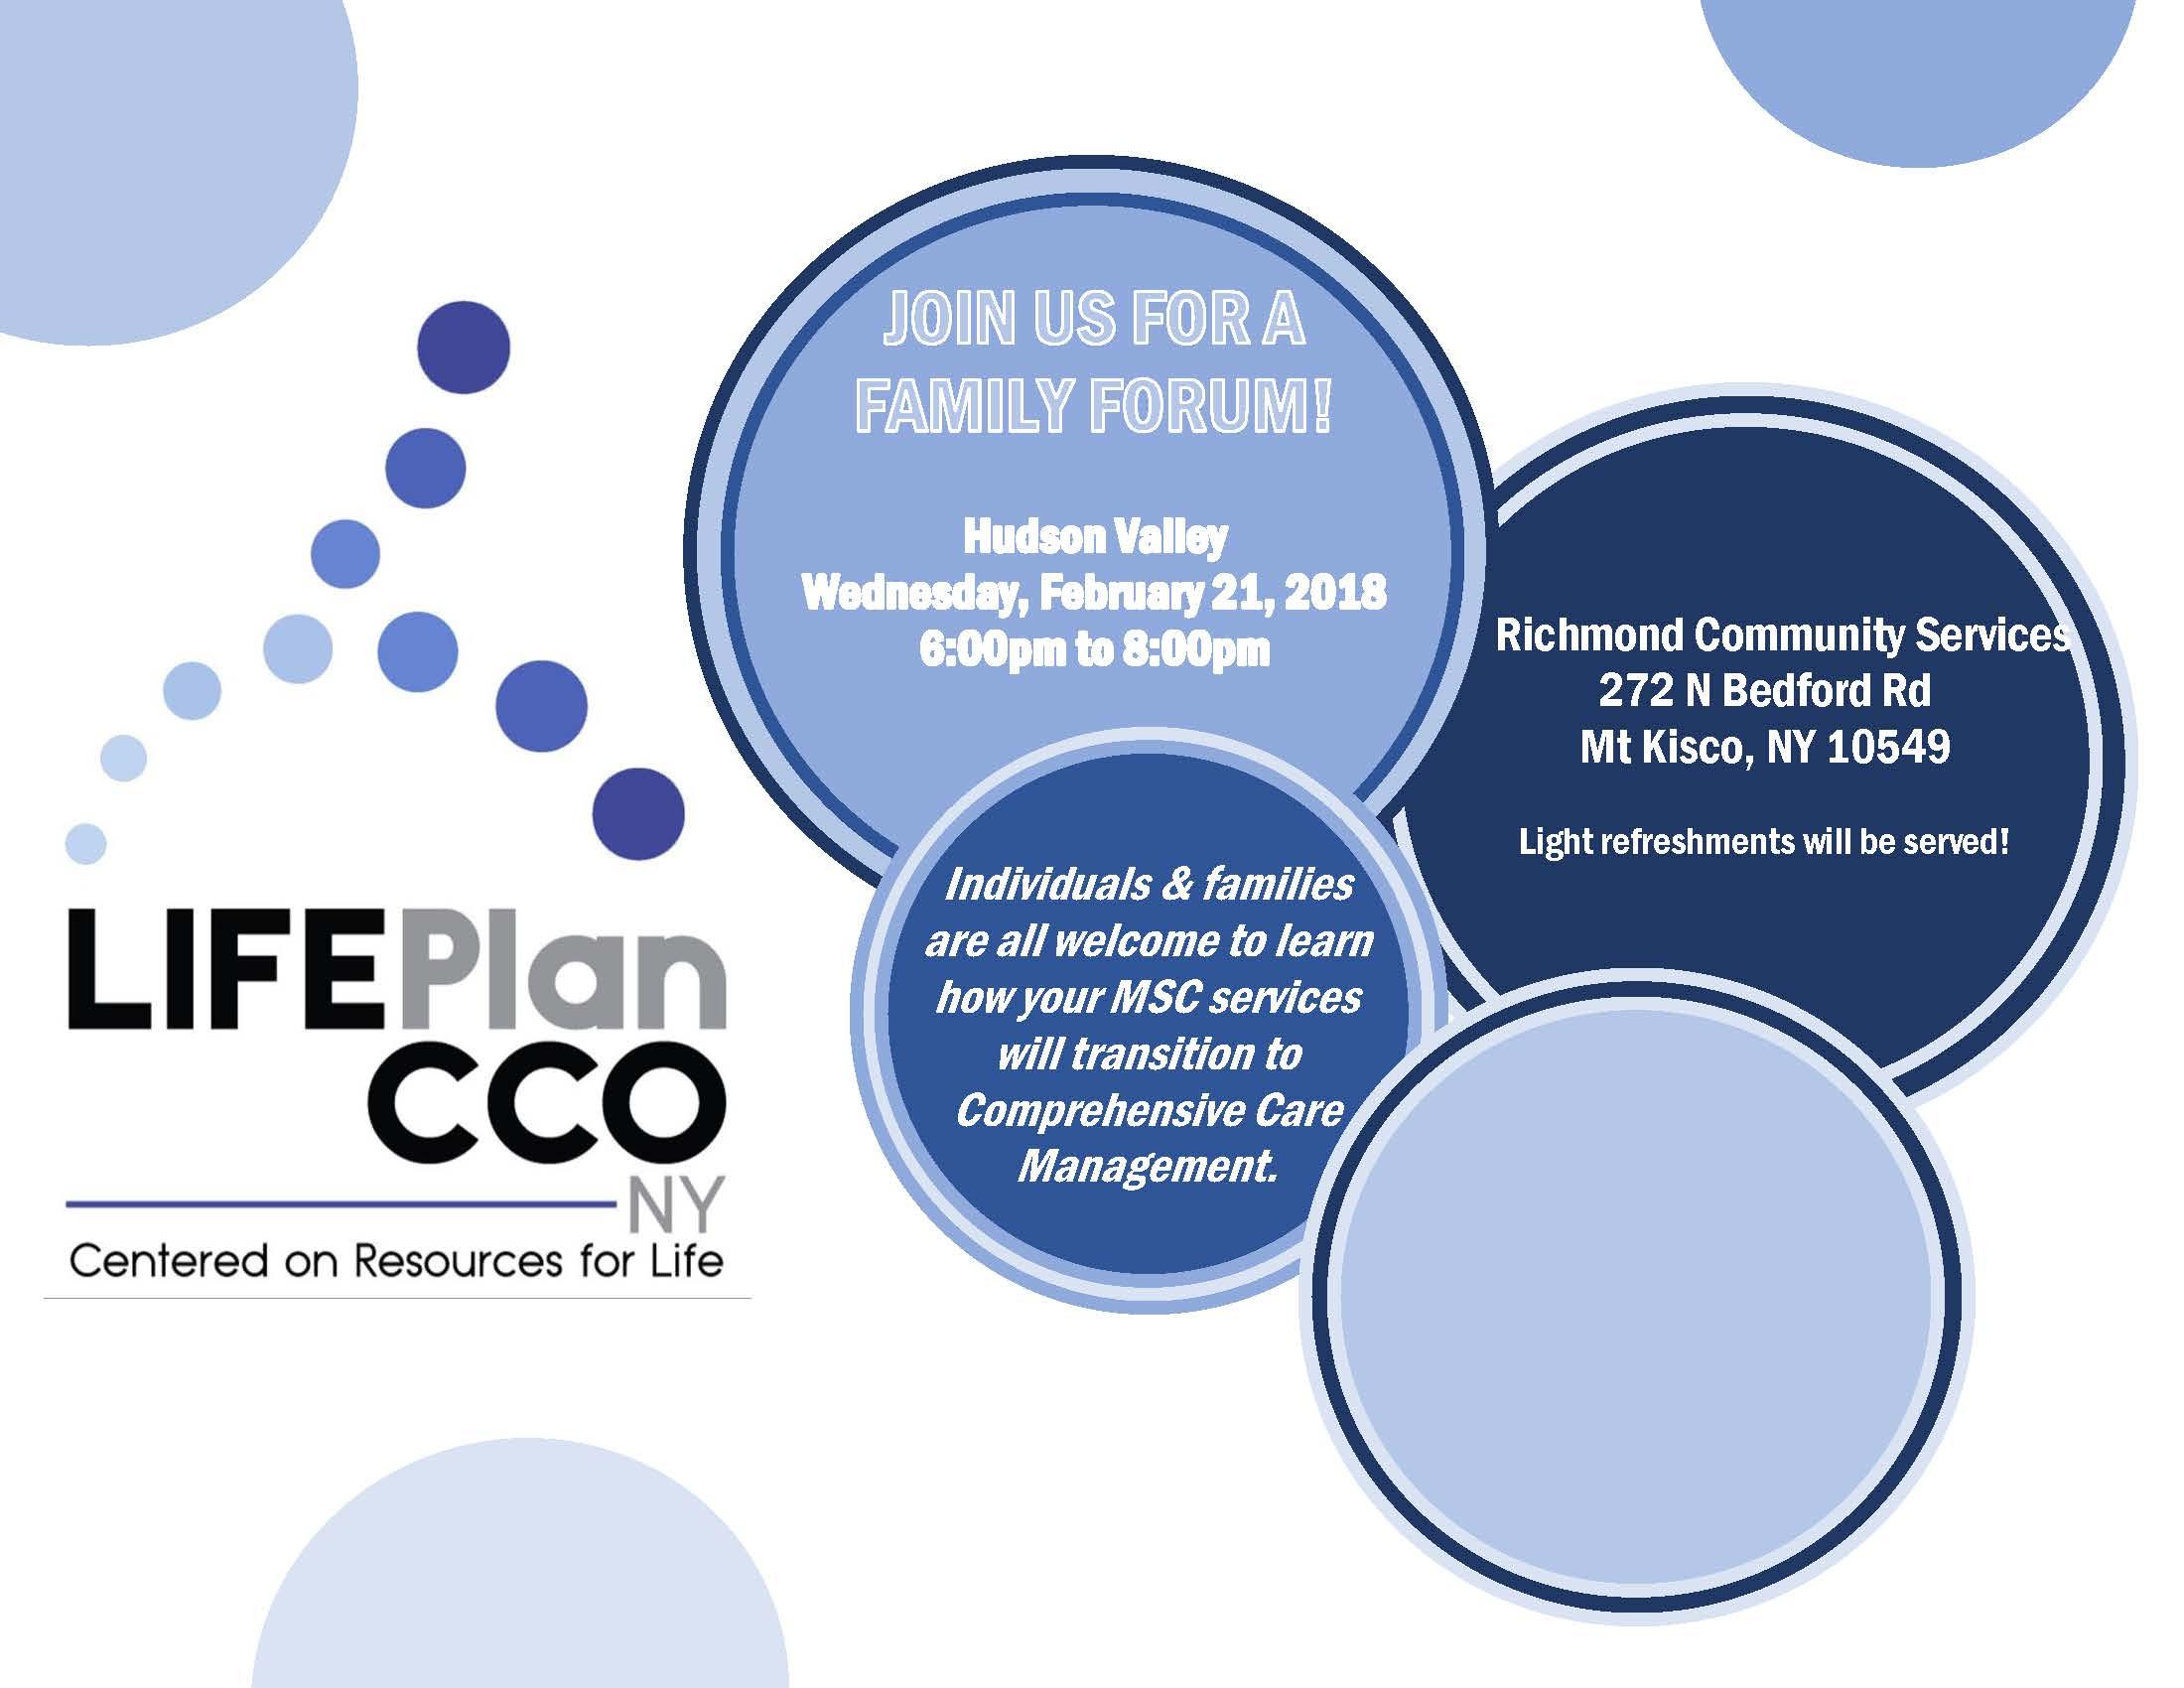 Life Plan CCO Family Meeting